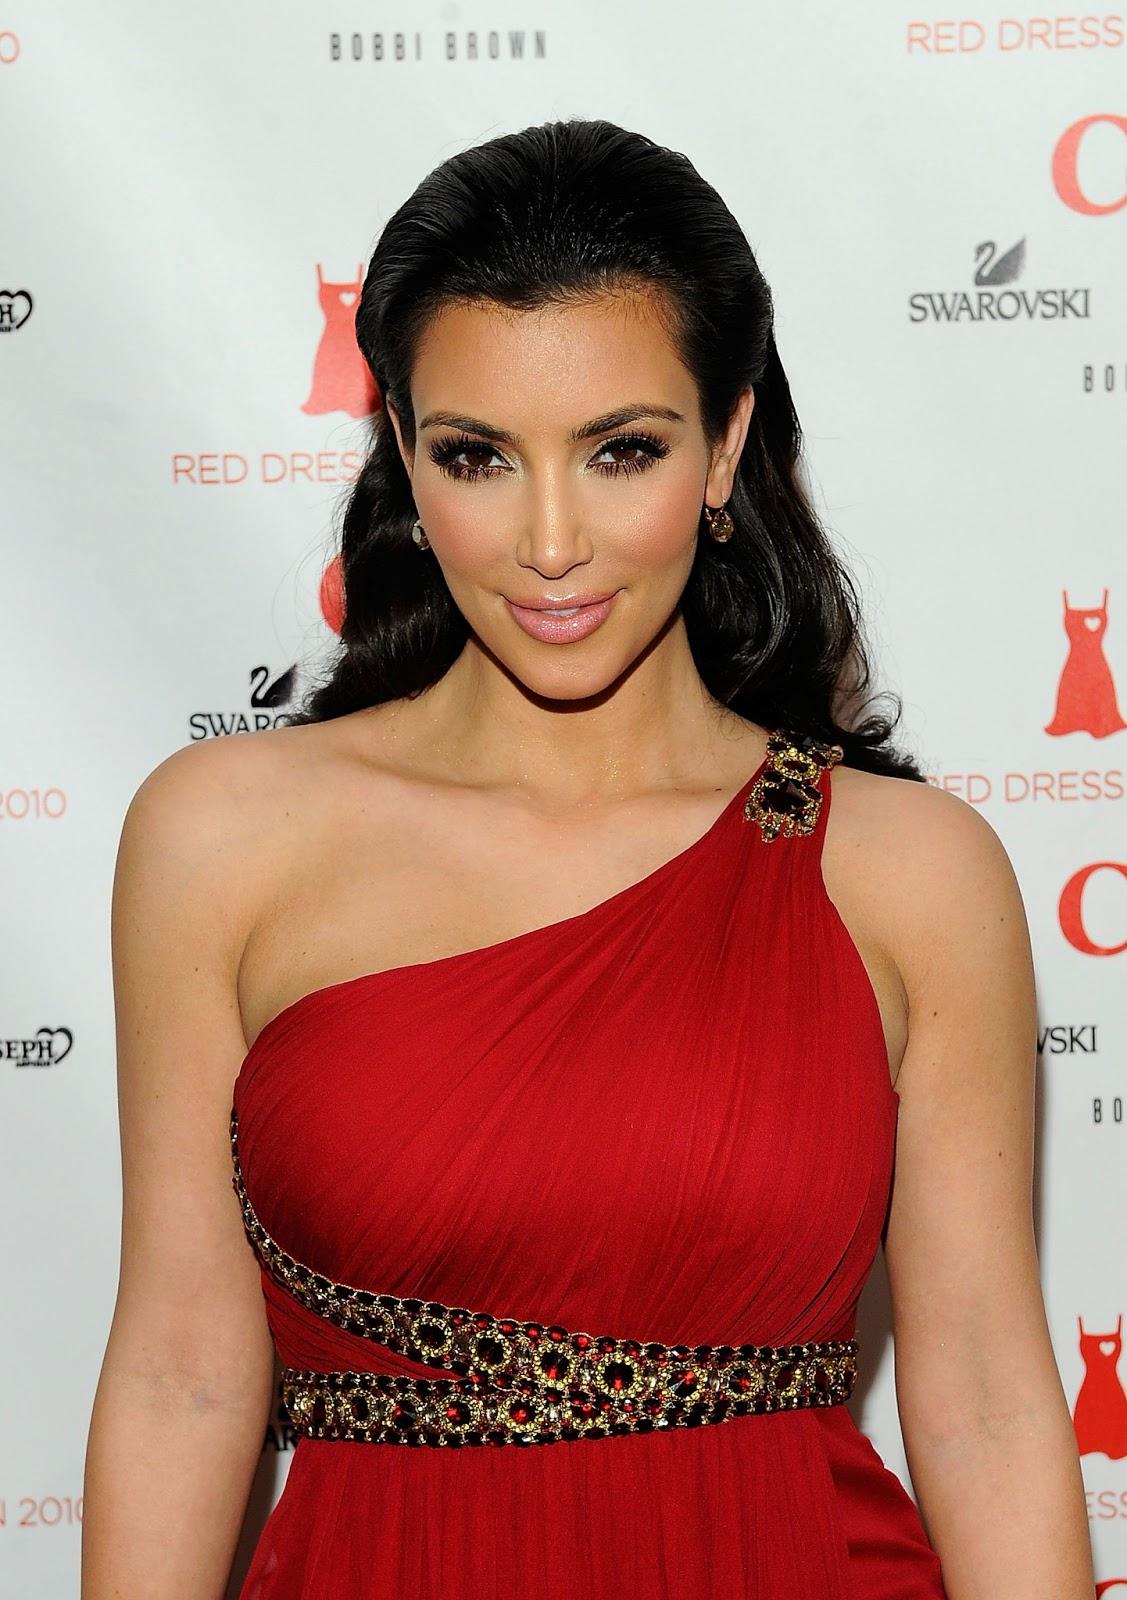 http://3.bp.blogspot.com/-oZoGT-r9M0g/UWjMHPdMXdI/AAAAAAAAa2I/ZZUr9xAMliA/s1600/kim+kardashian+dress+2013+(9).jpg